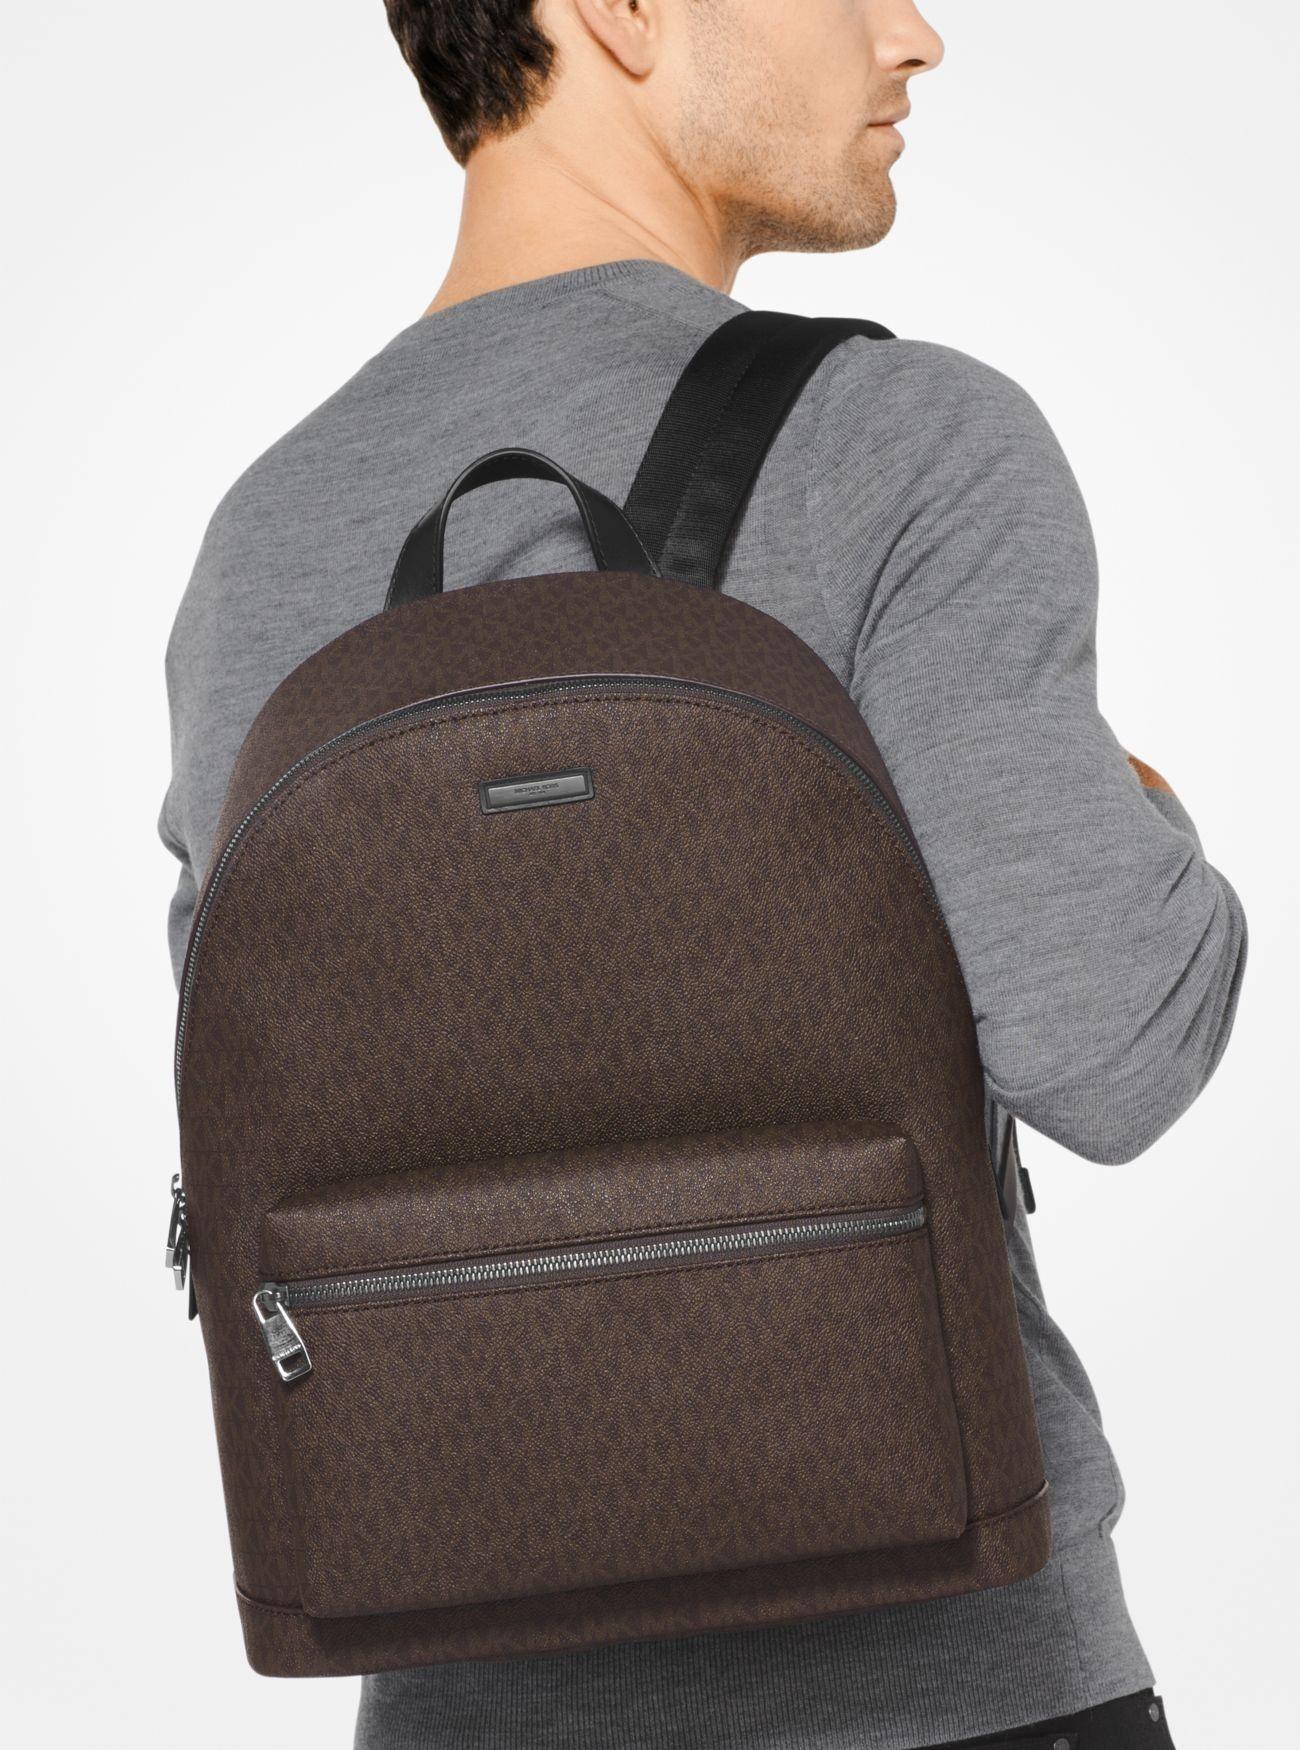 dc7a3bef2e3cf Price Michael Kors Brown Mens Jet Set Logo Backpack Shop